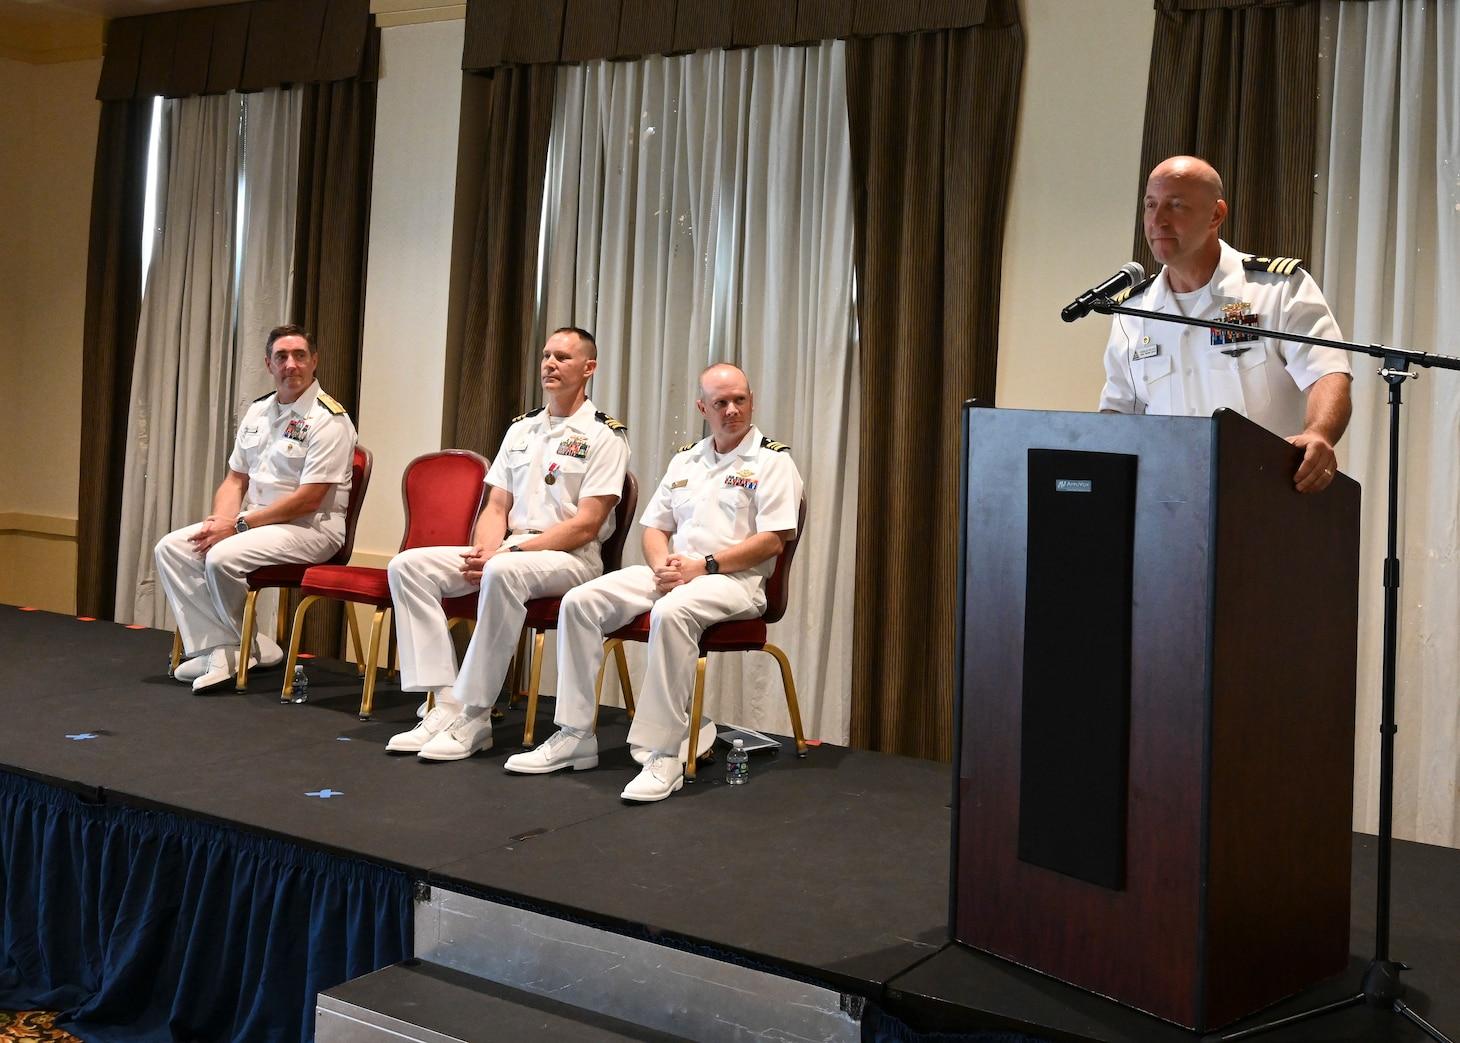 NAVSAFENVTRACEN Change of Command